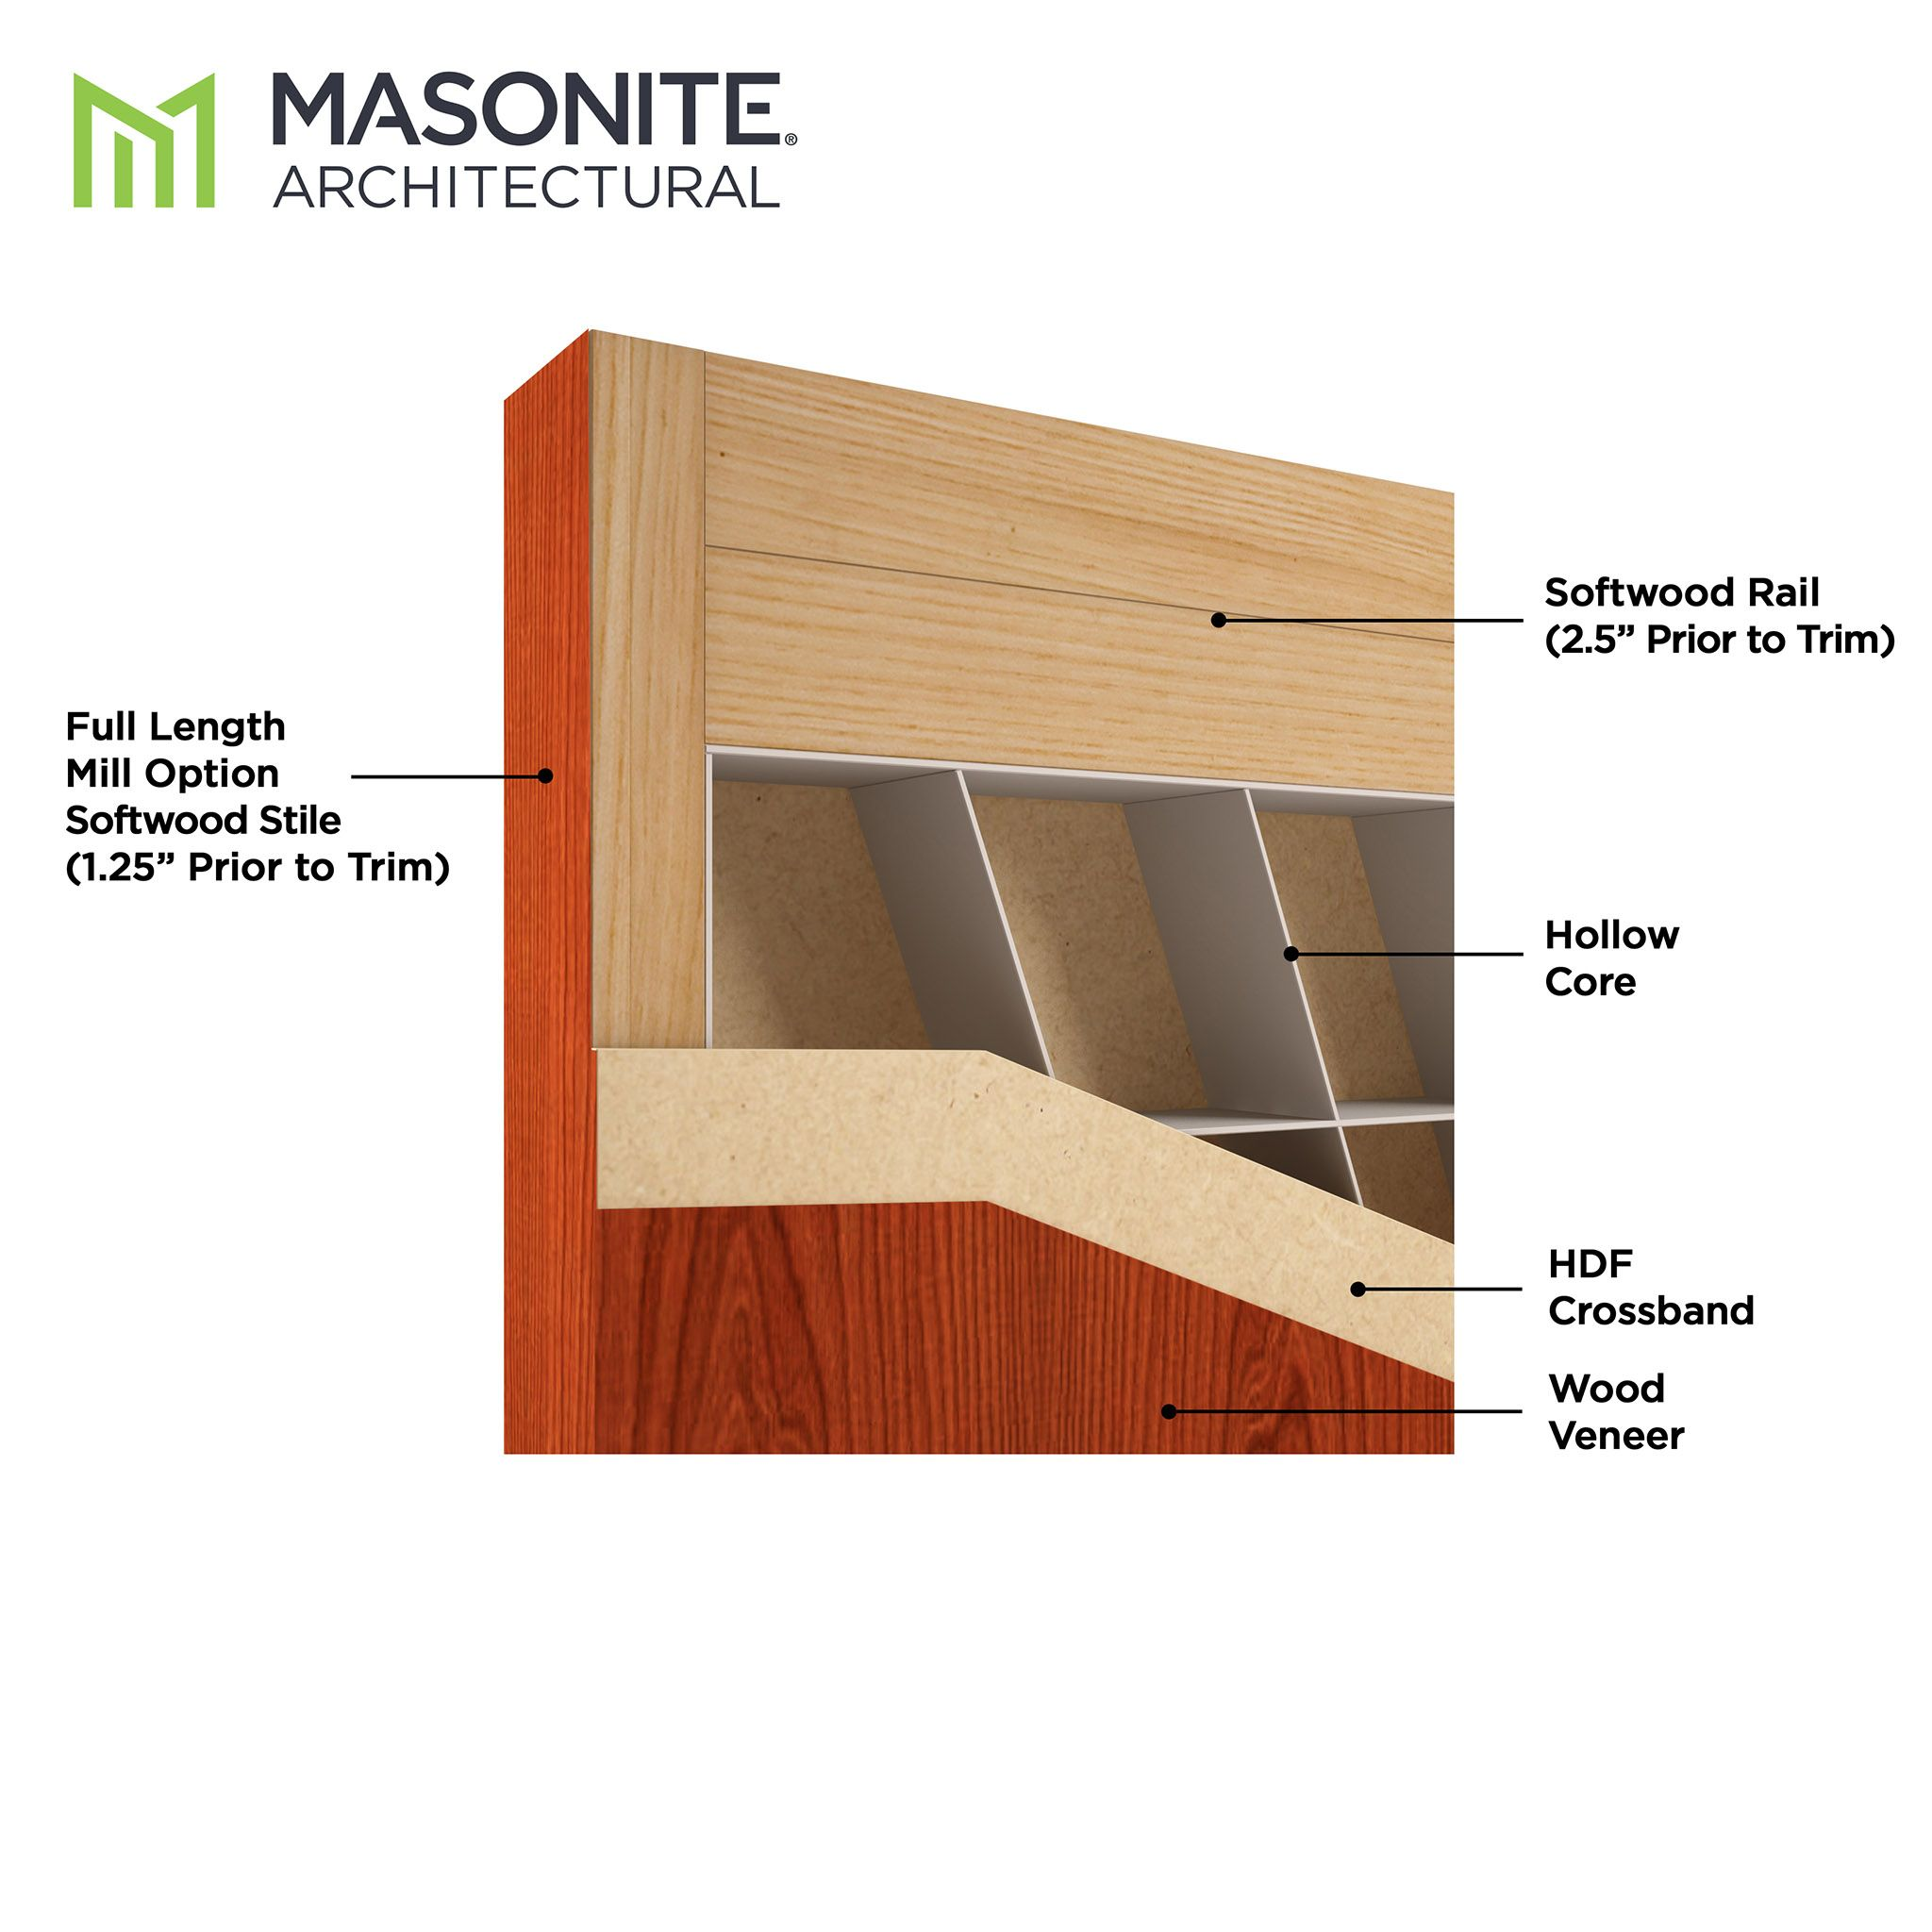 Cendura Wood Veneer Surface Hollow Core Stile and Rail Door Section